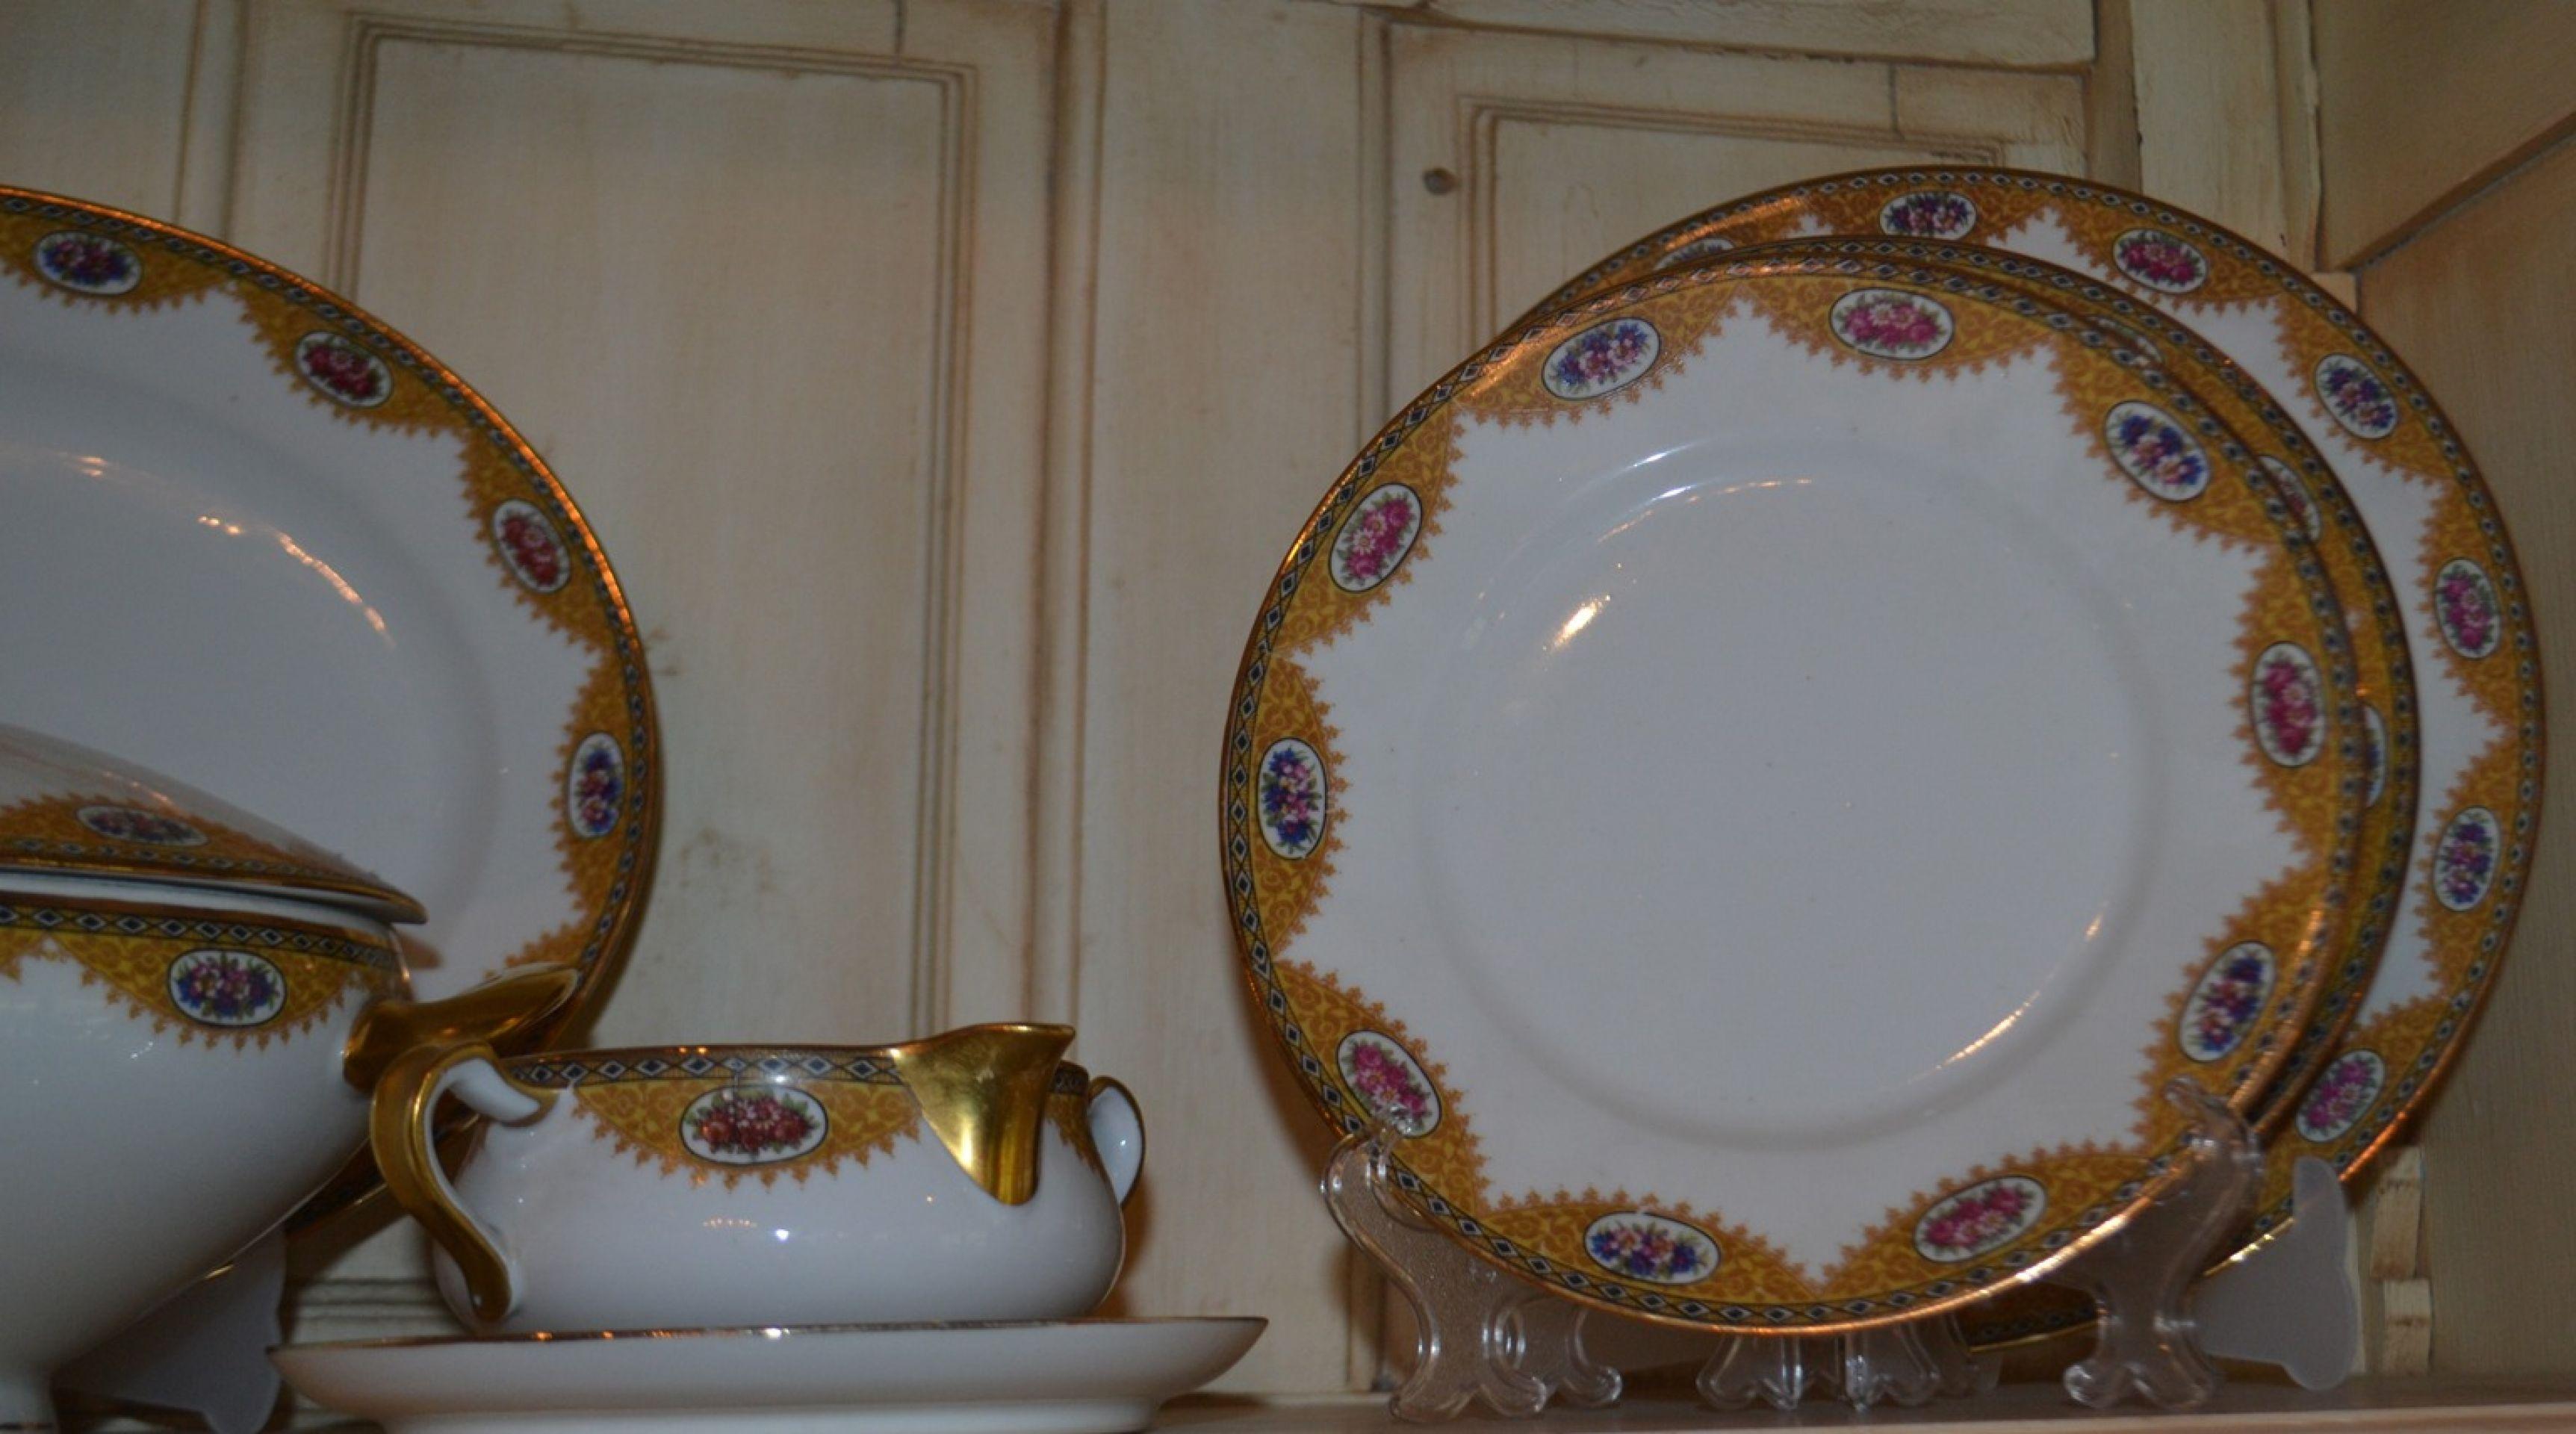 52 Piece set of Limoges Porcelain Dinnerware